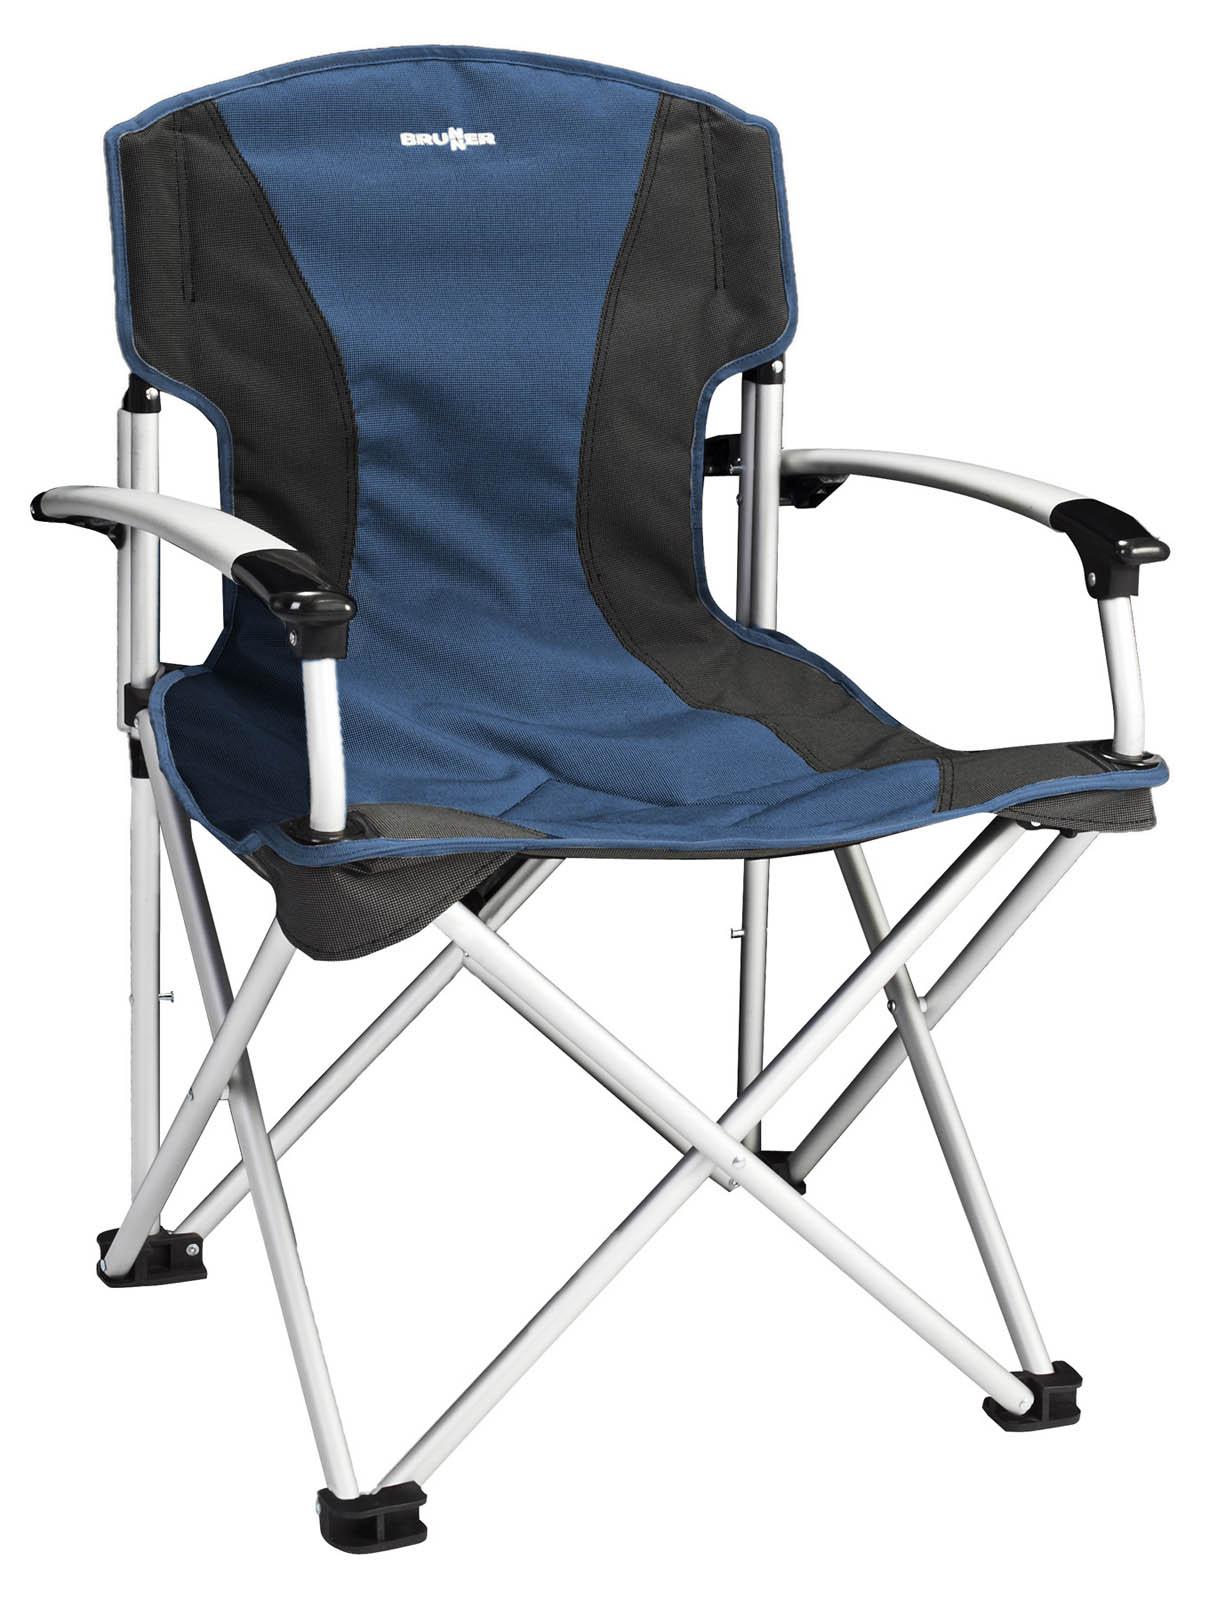 Mobiliario camping outdoor caravaning mania - Silla tumbona ...